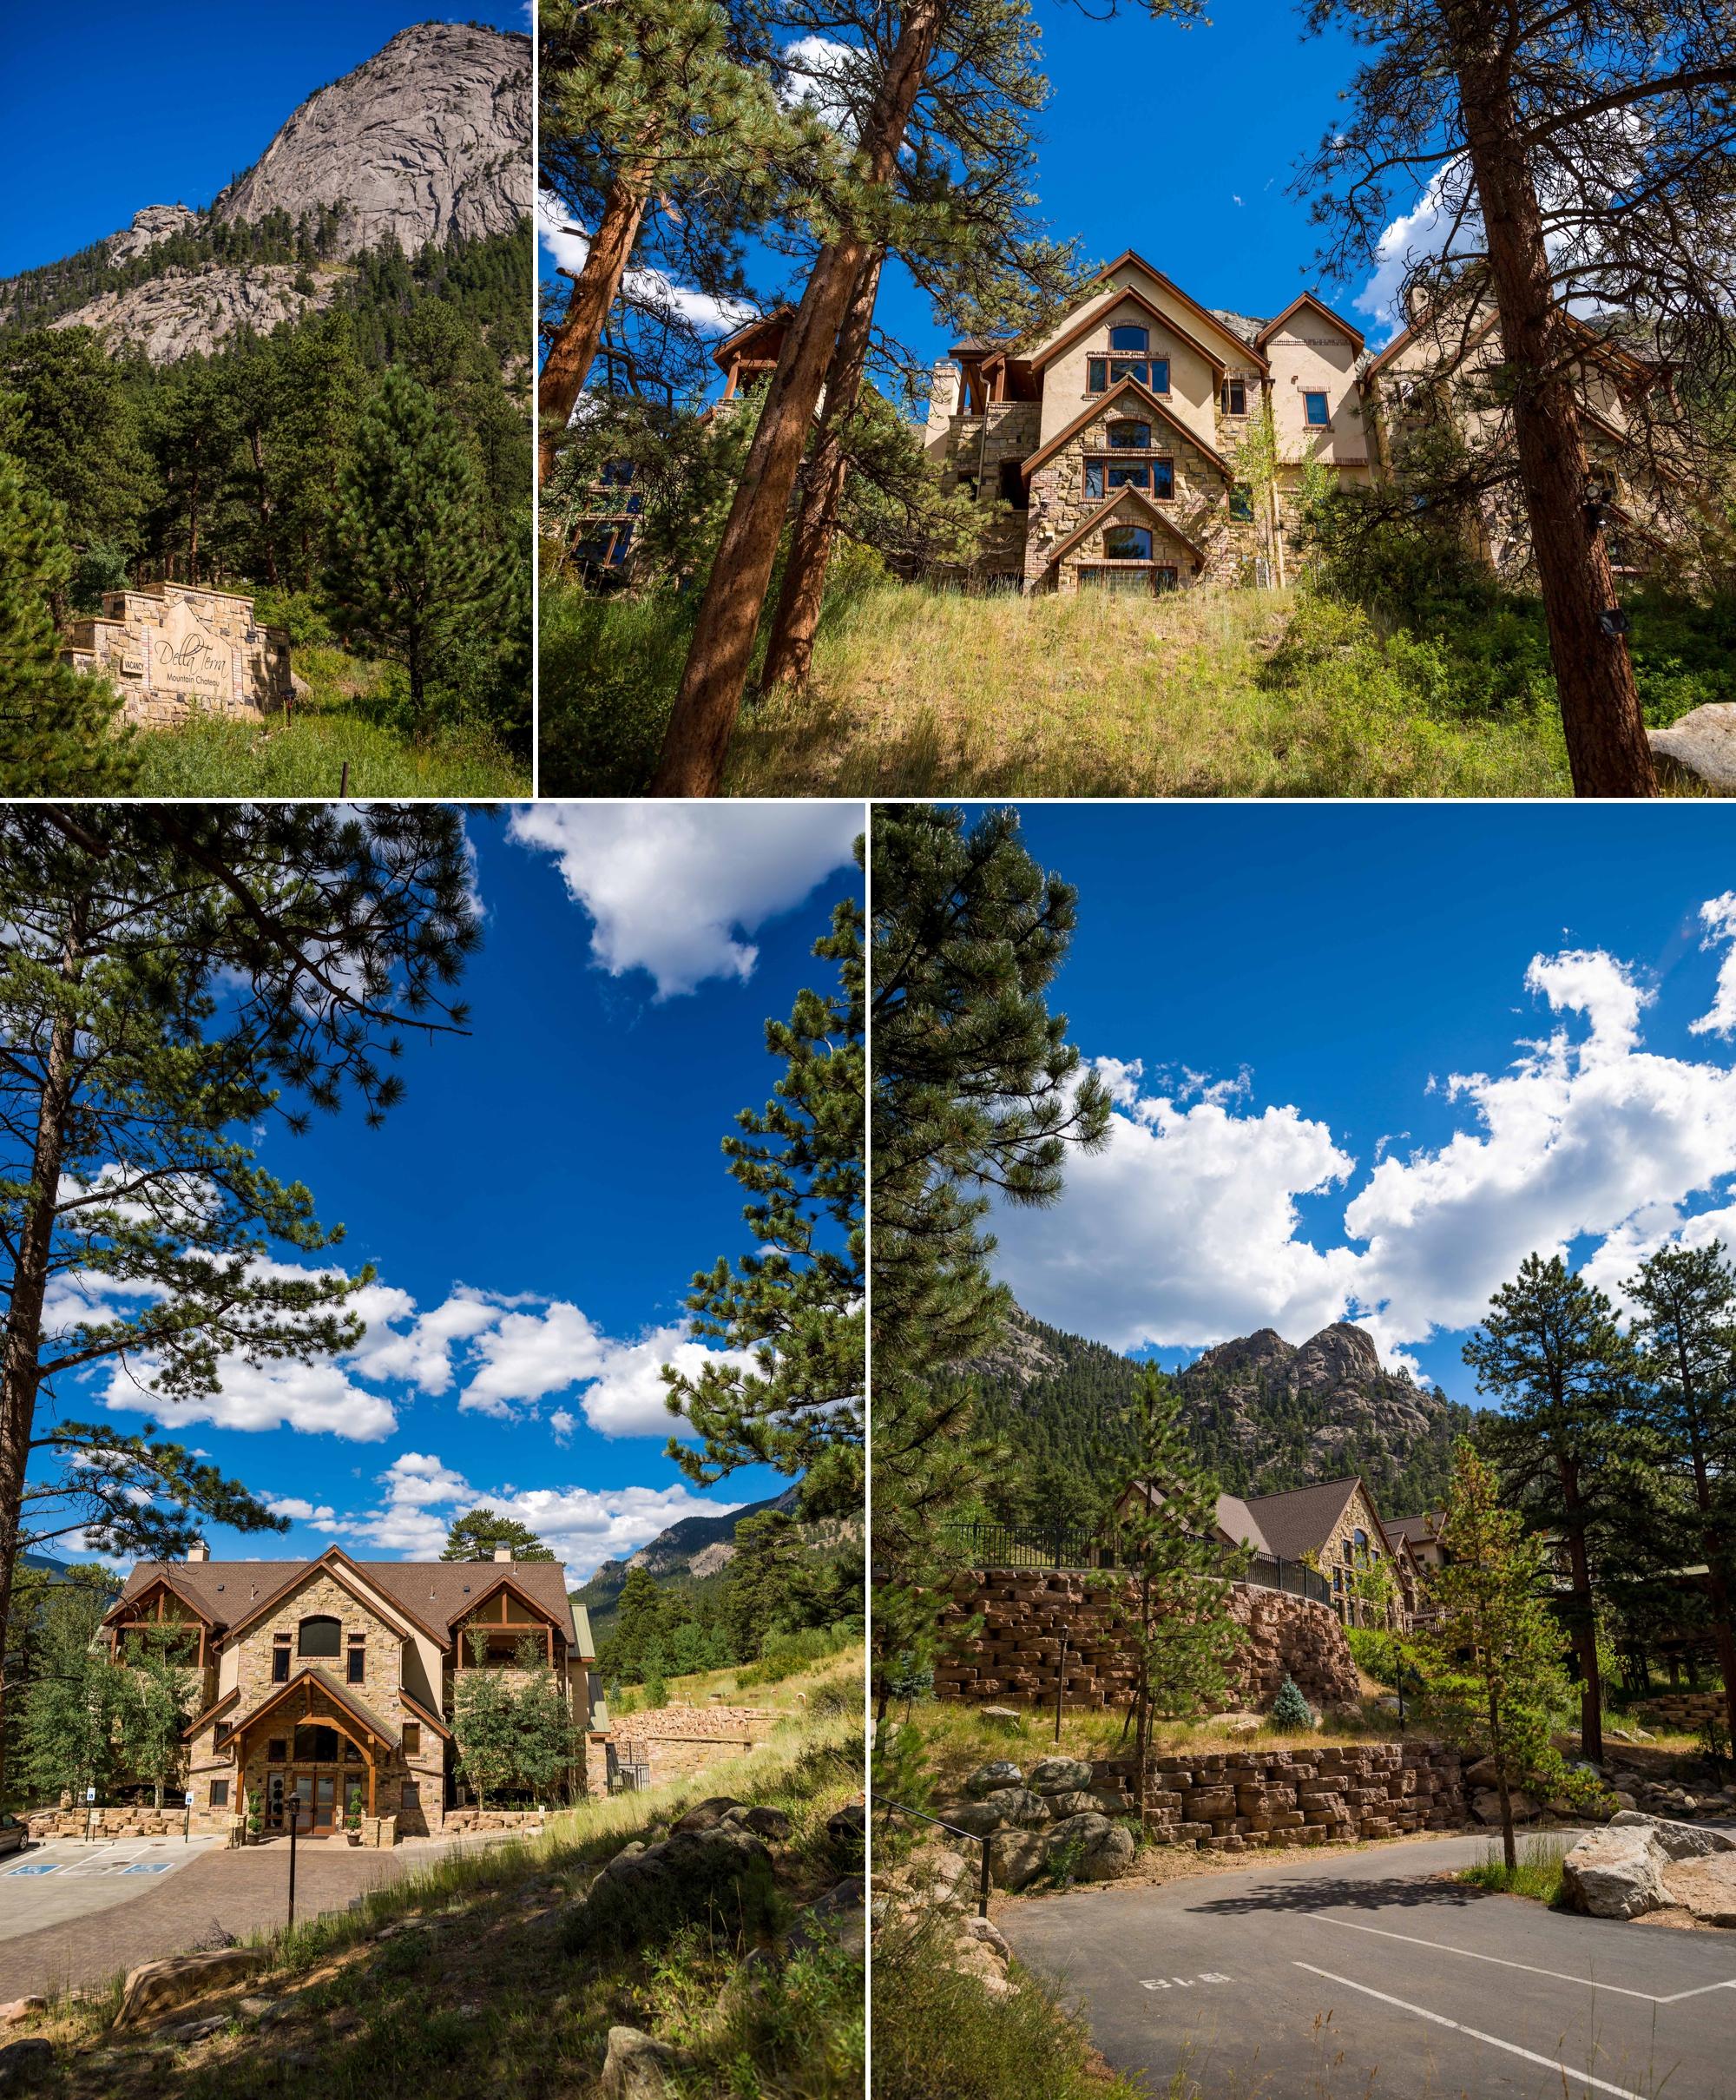 Della Terra Mountain Chateau in August, Estes Park, Colorado